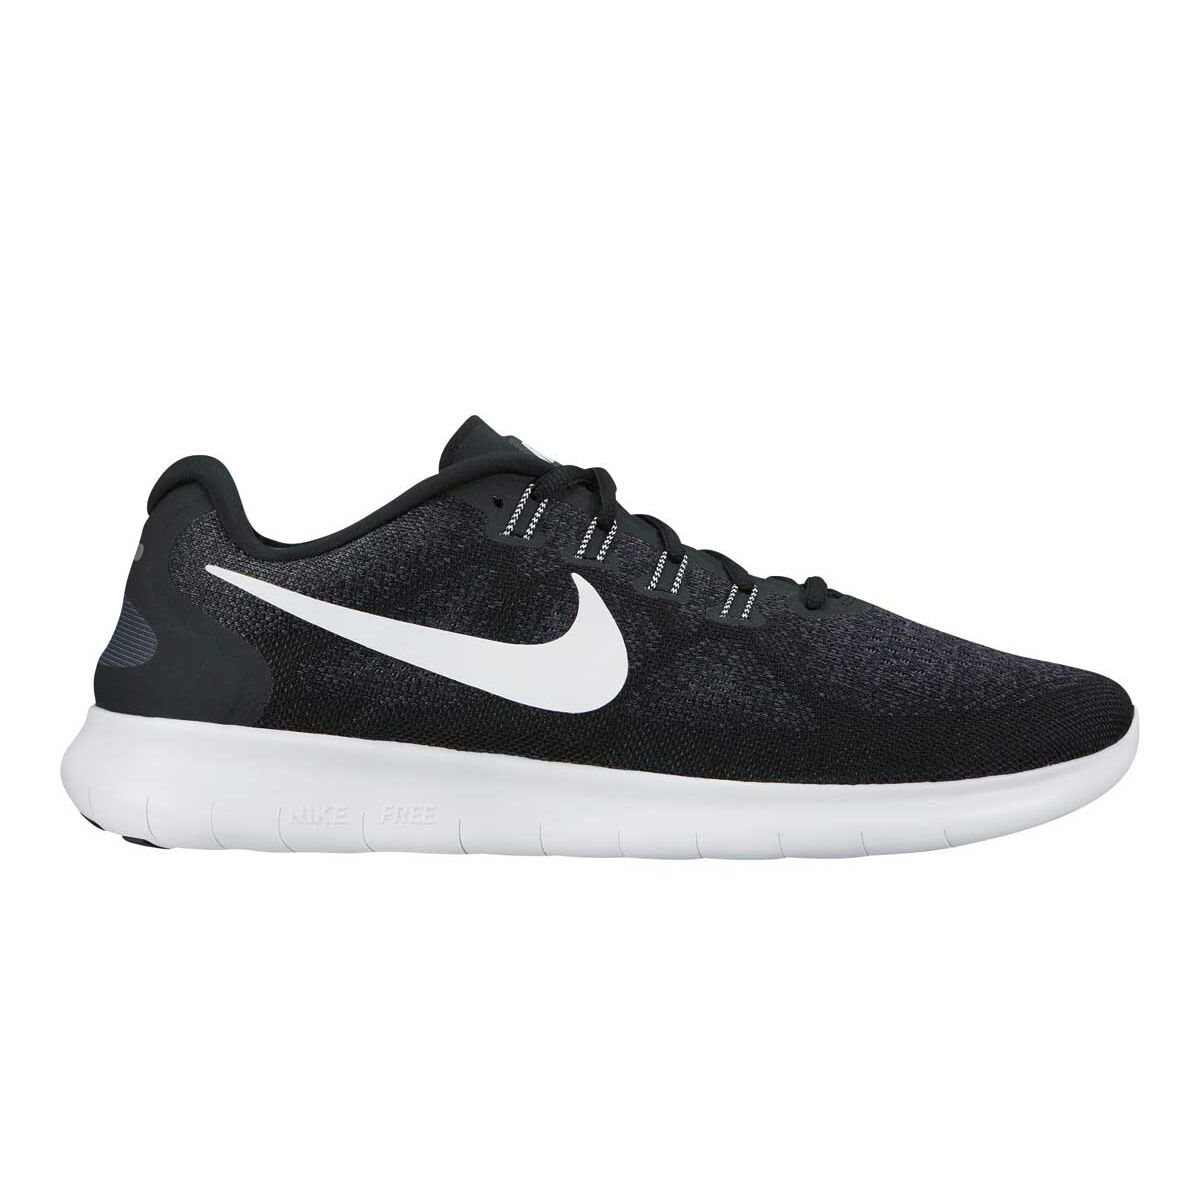 nike free run 2 womens running shoes black white us 9 5 rebel sport rh rebelsport com au nike free run 5.0 womens 9.5 nike free run 5.0 womens 9.5